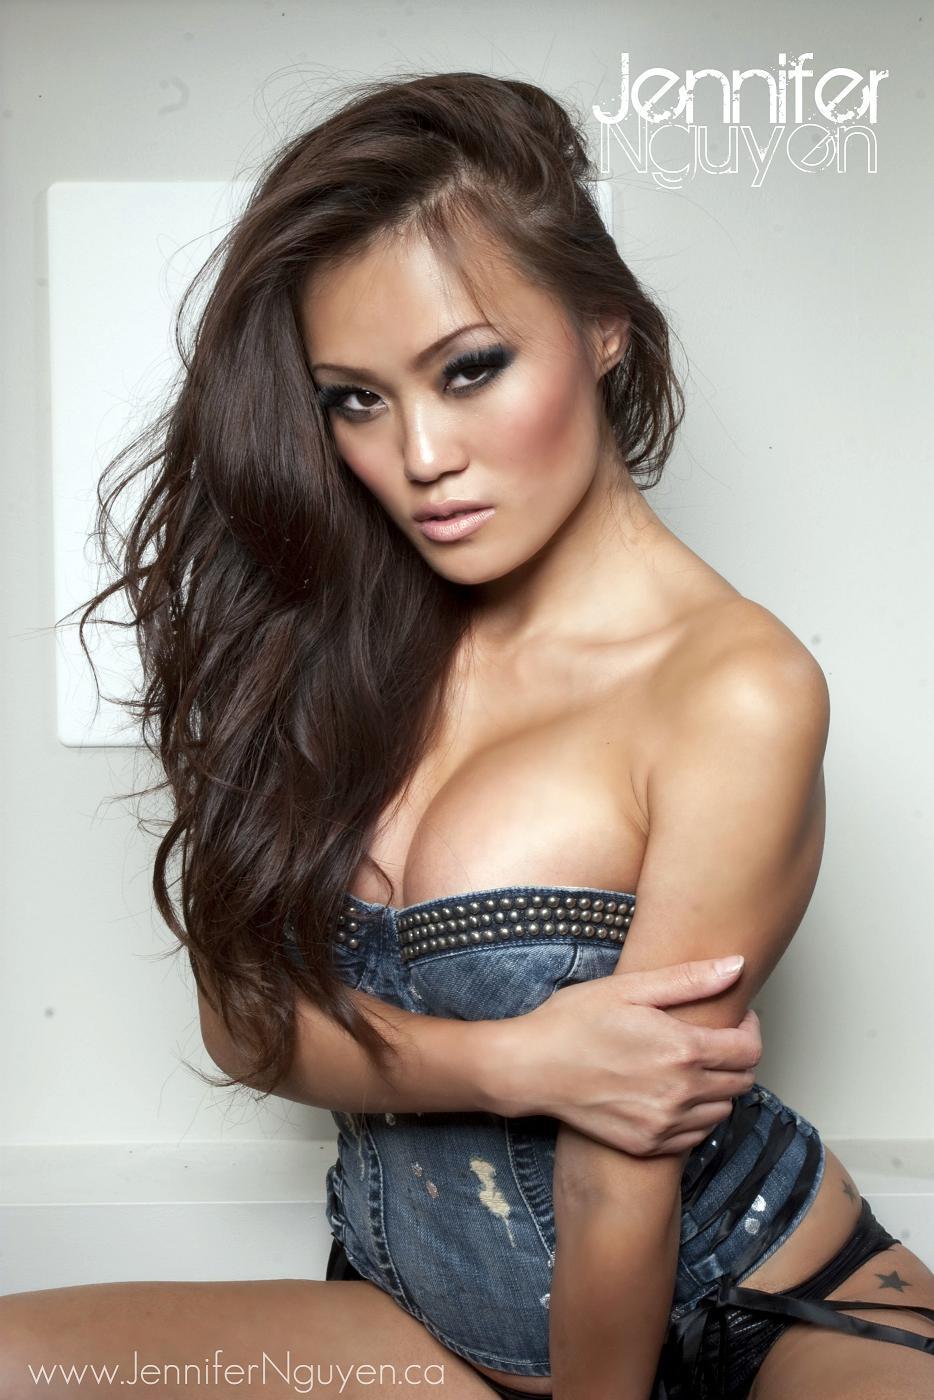 Jennifer Nguyen Porno #7